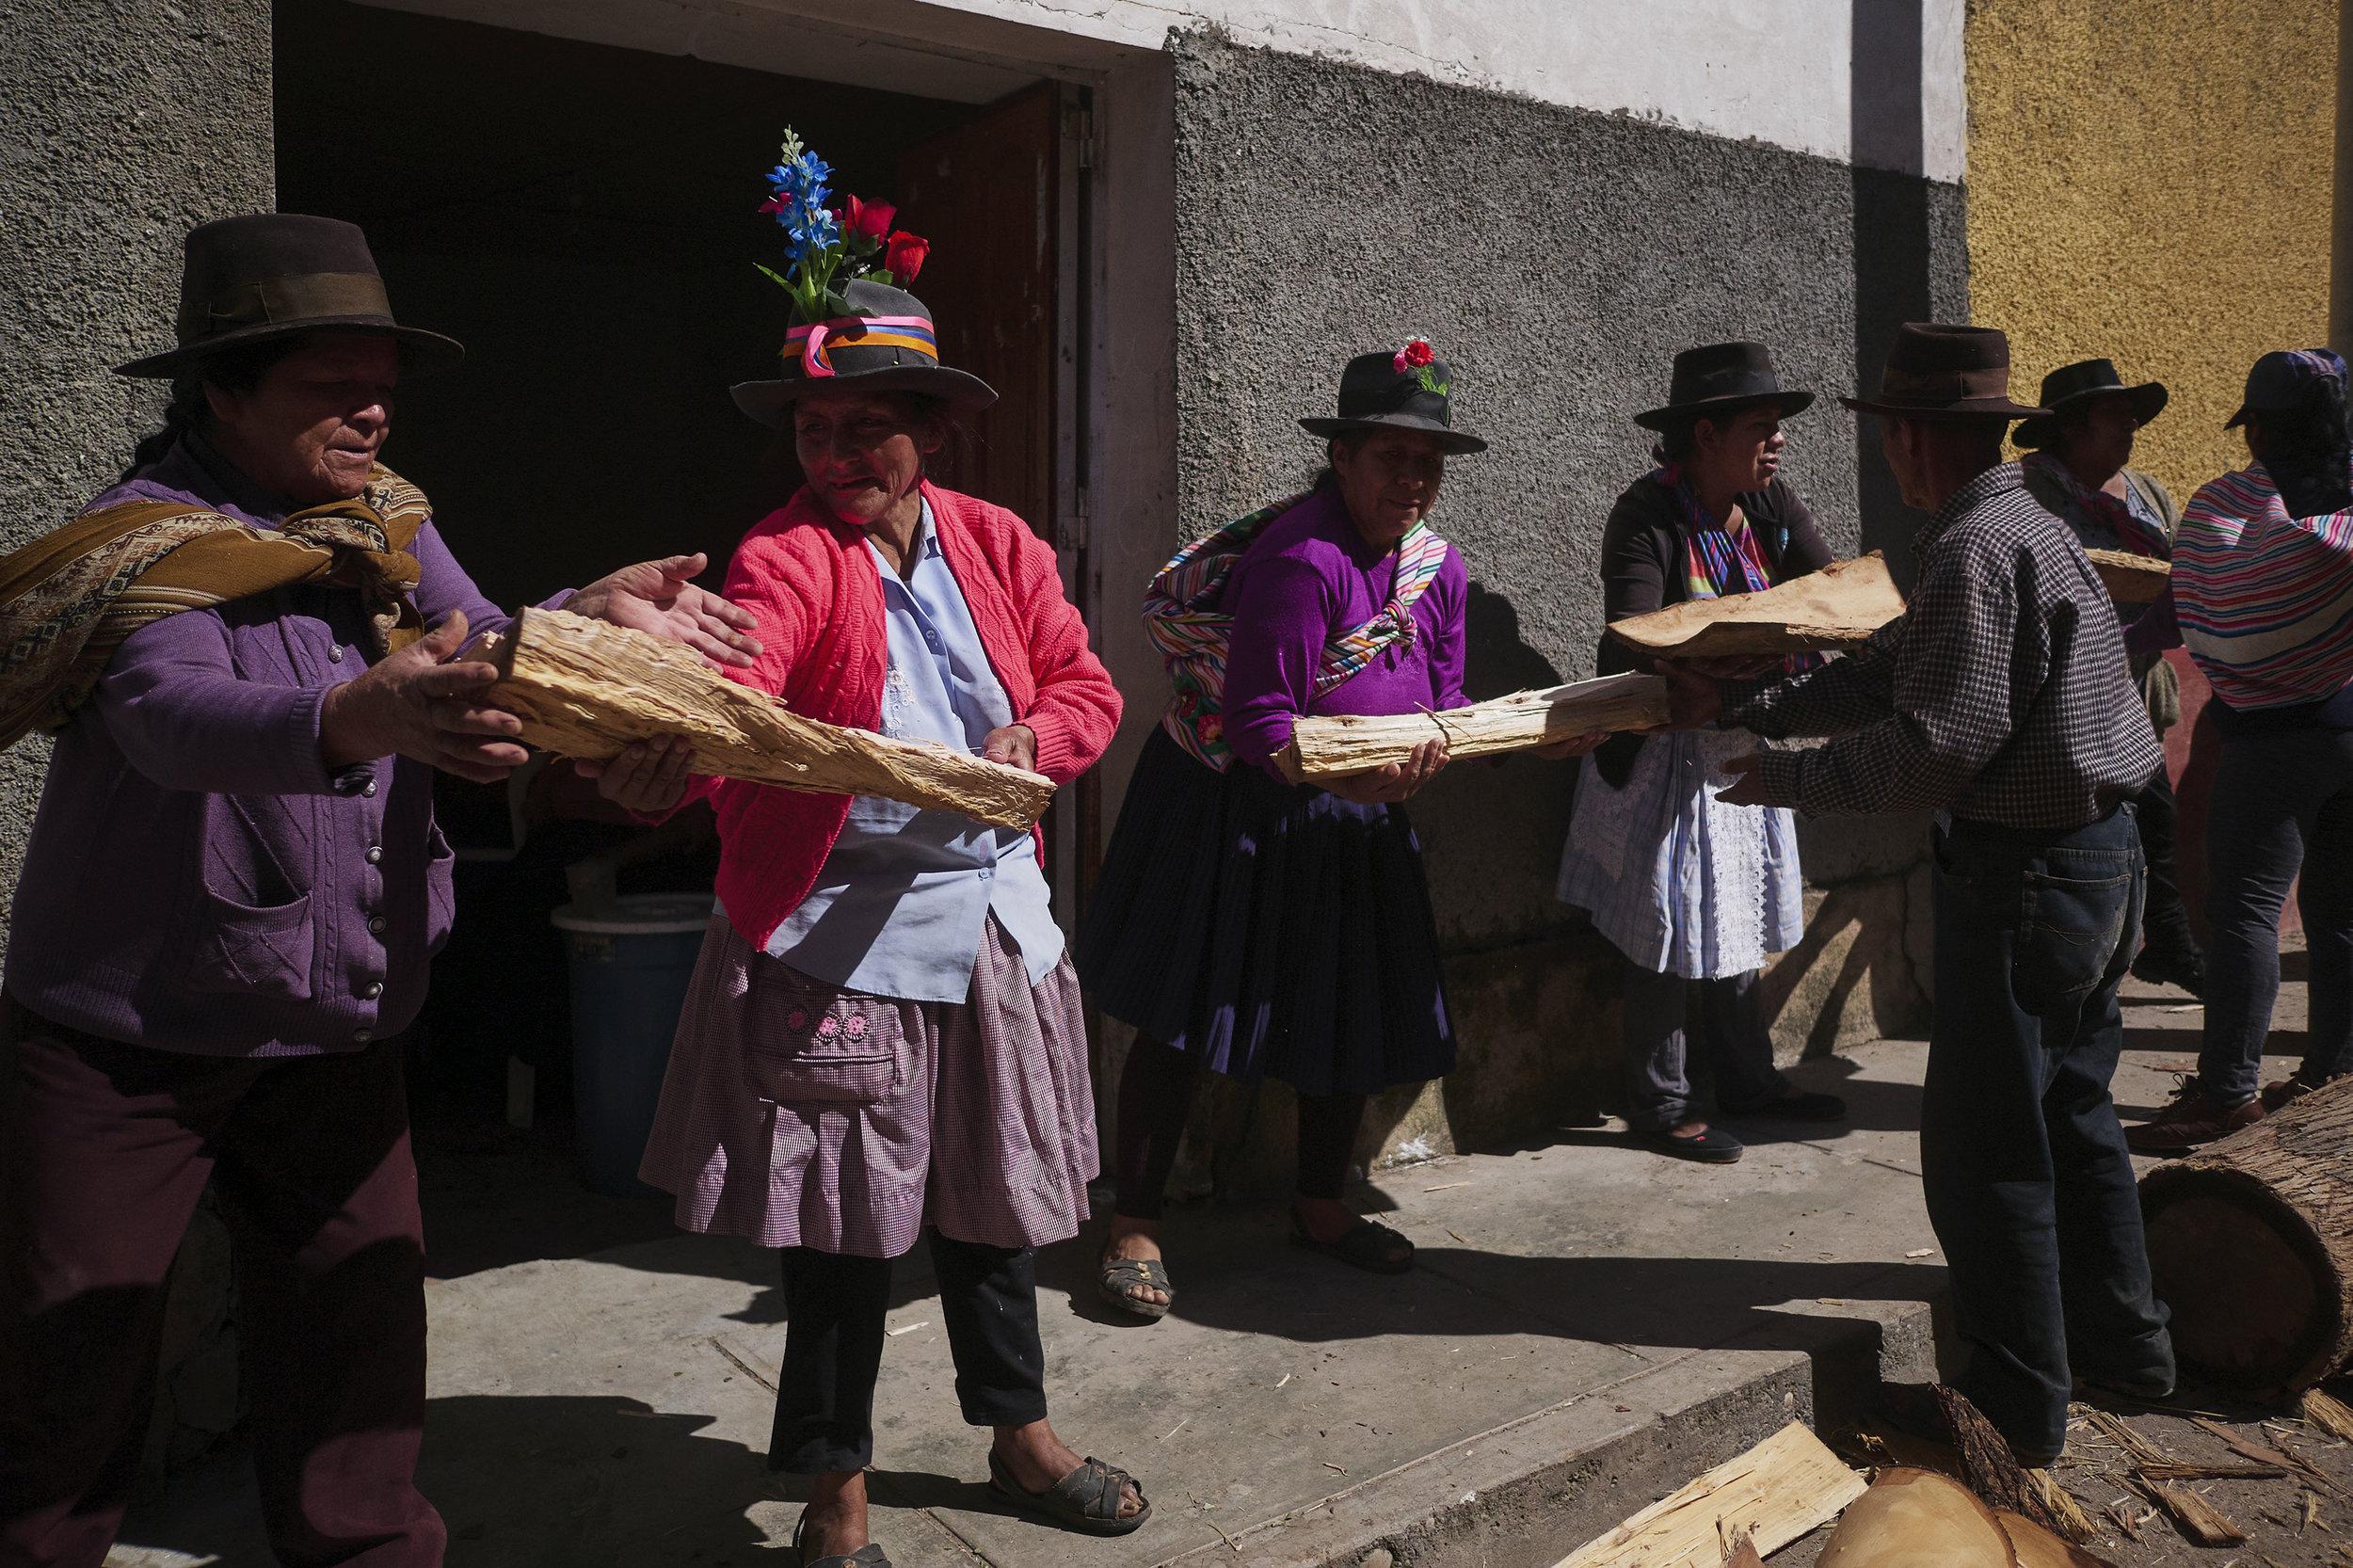 Palo alto Peru